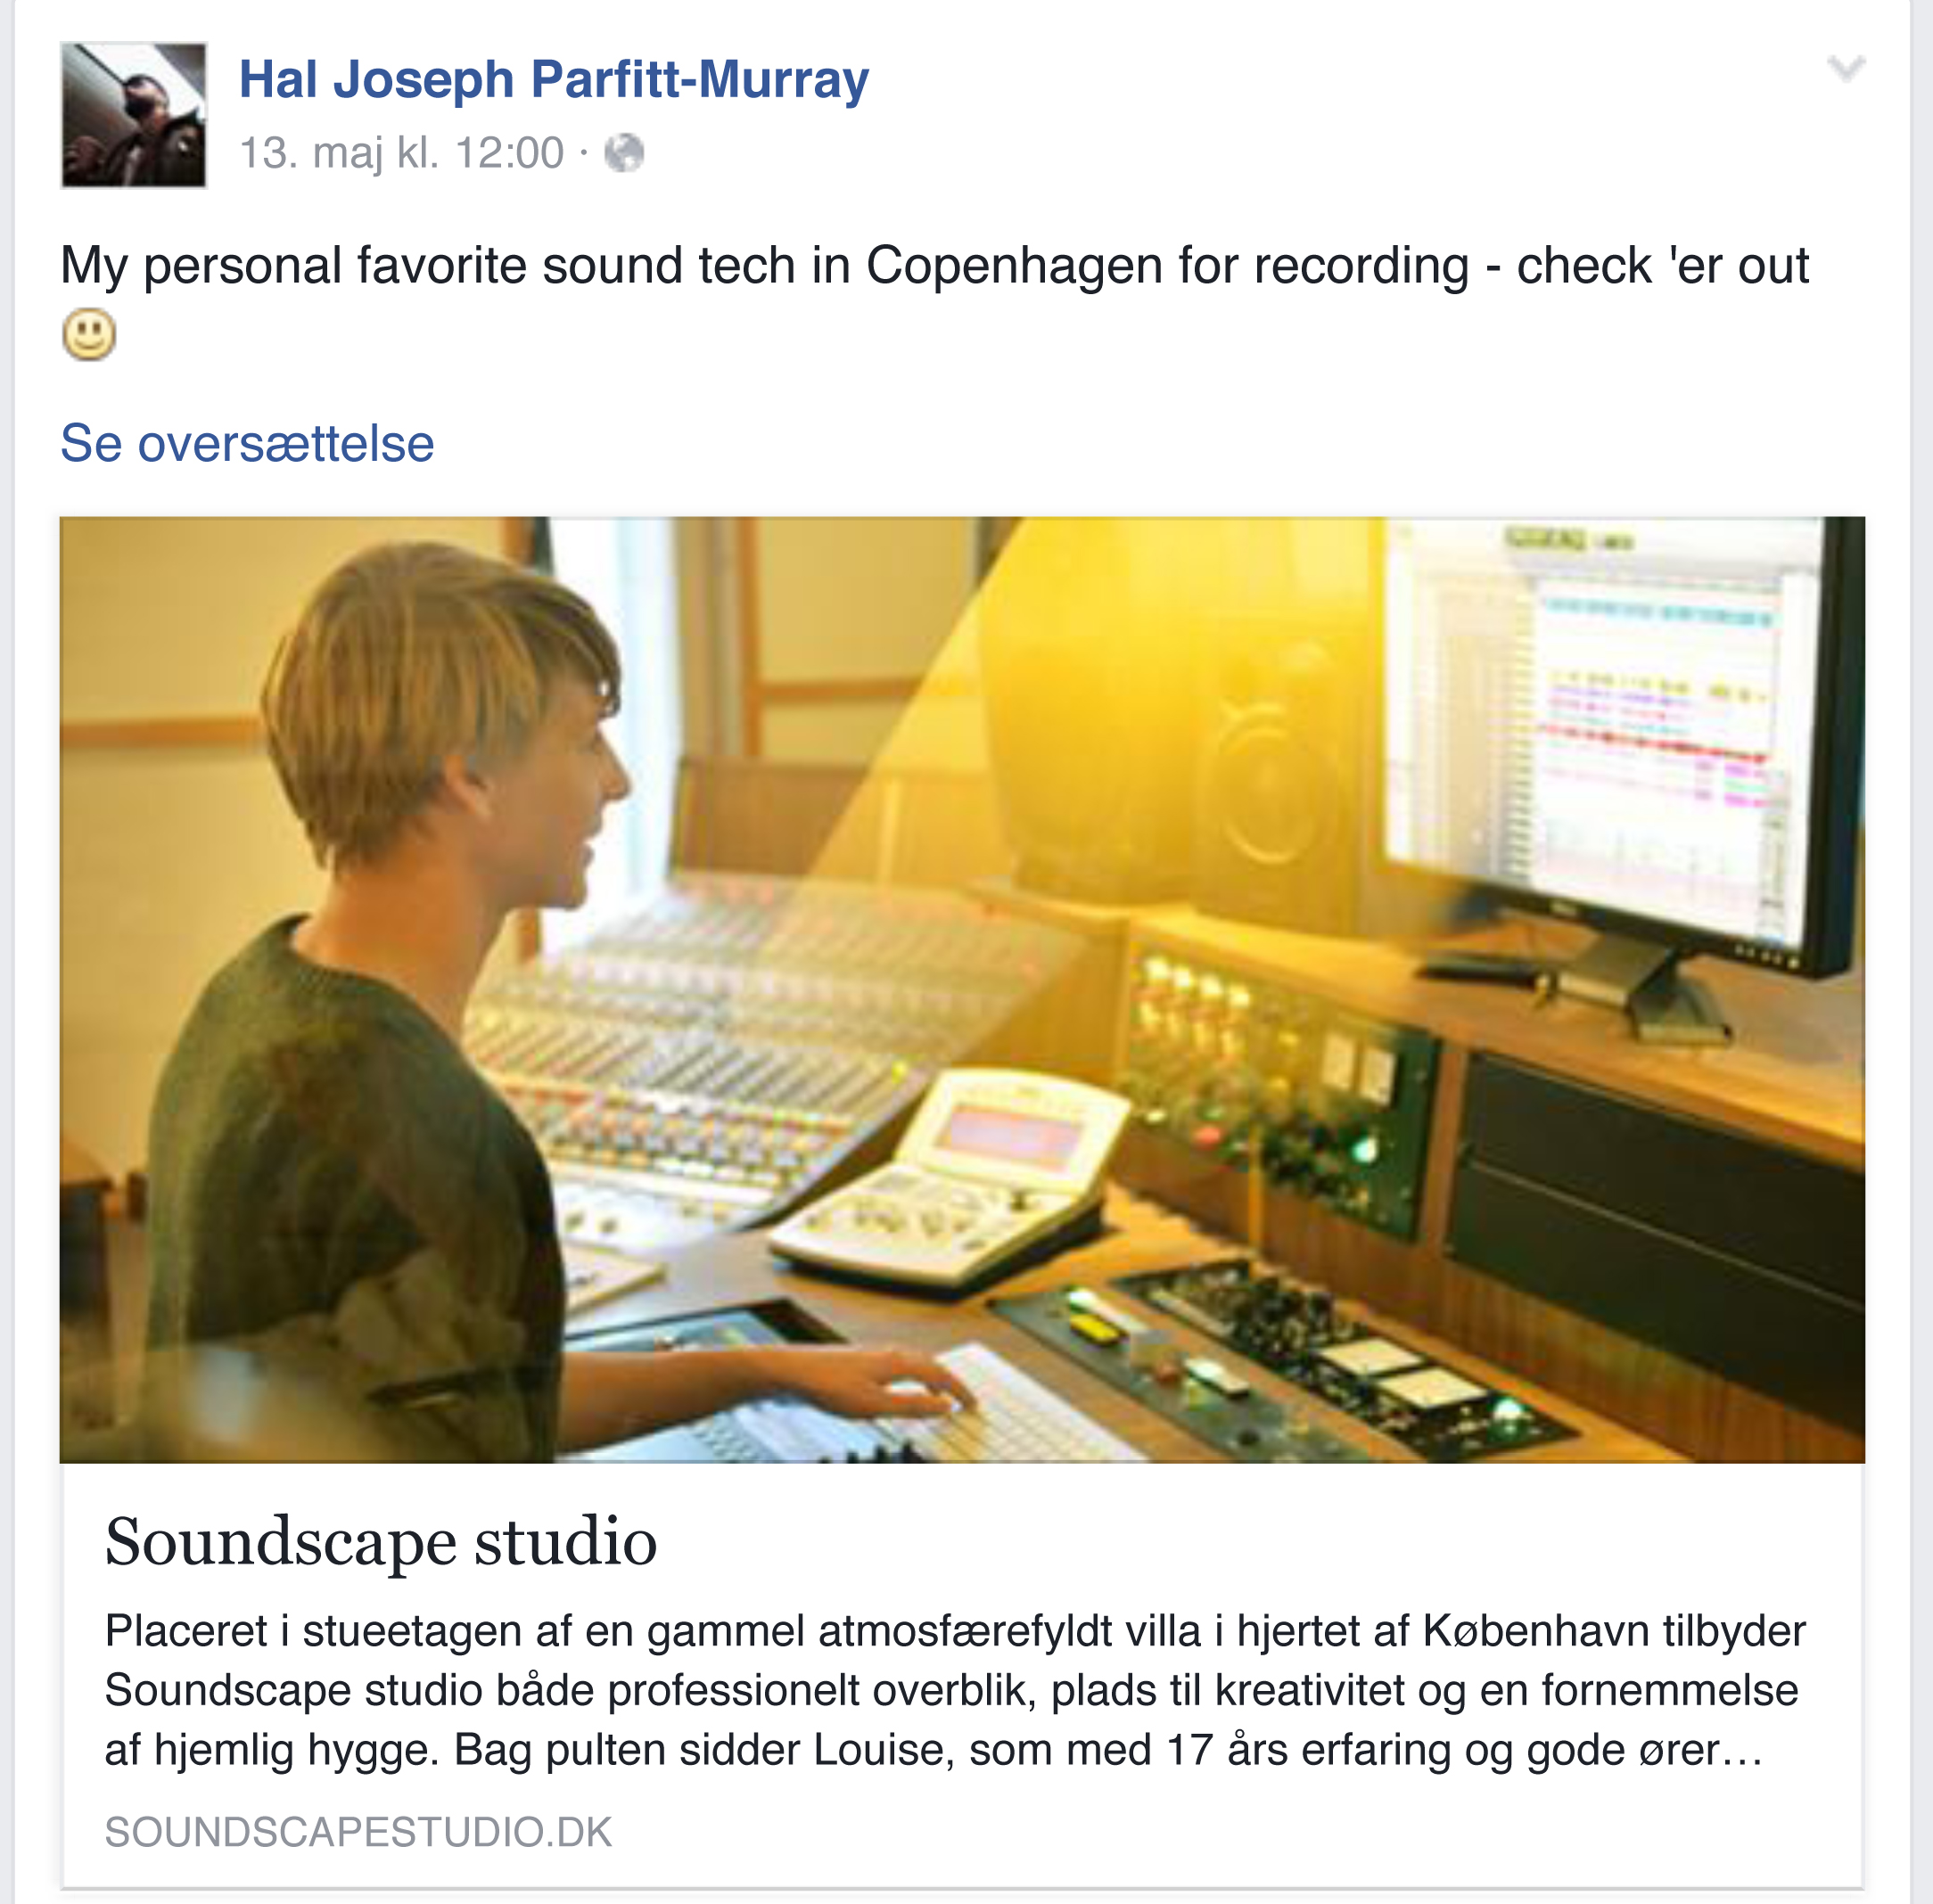 Hal Joseph Parfitt-Murray statement